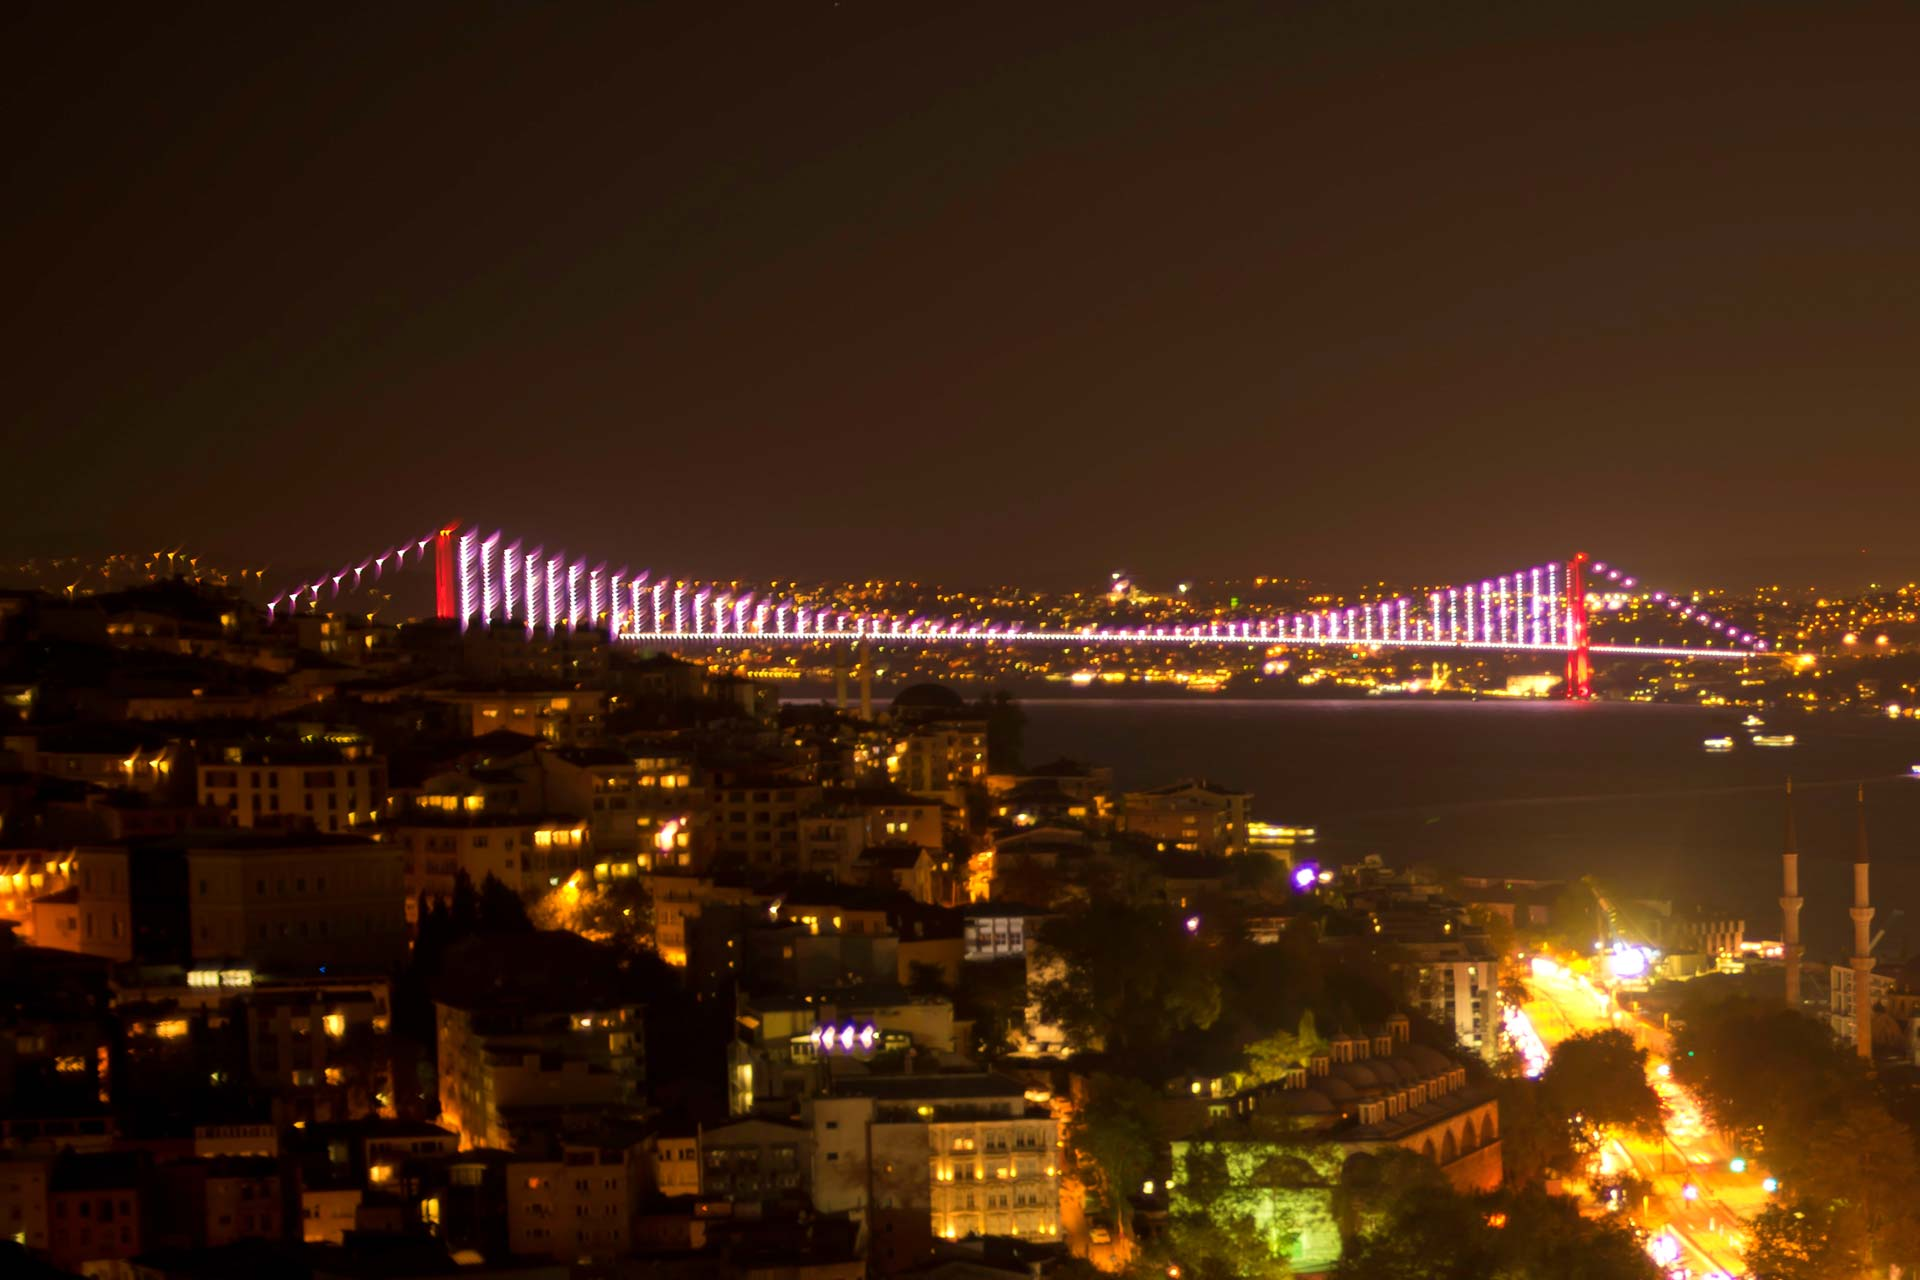 Landschaftsfotografie - Brücke bei Nacht